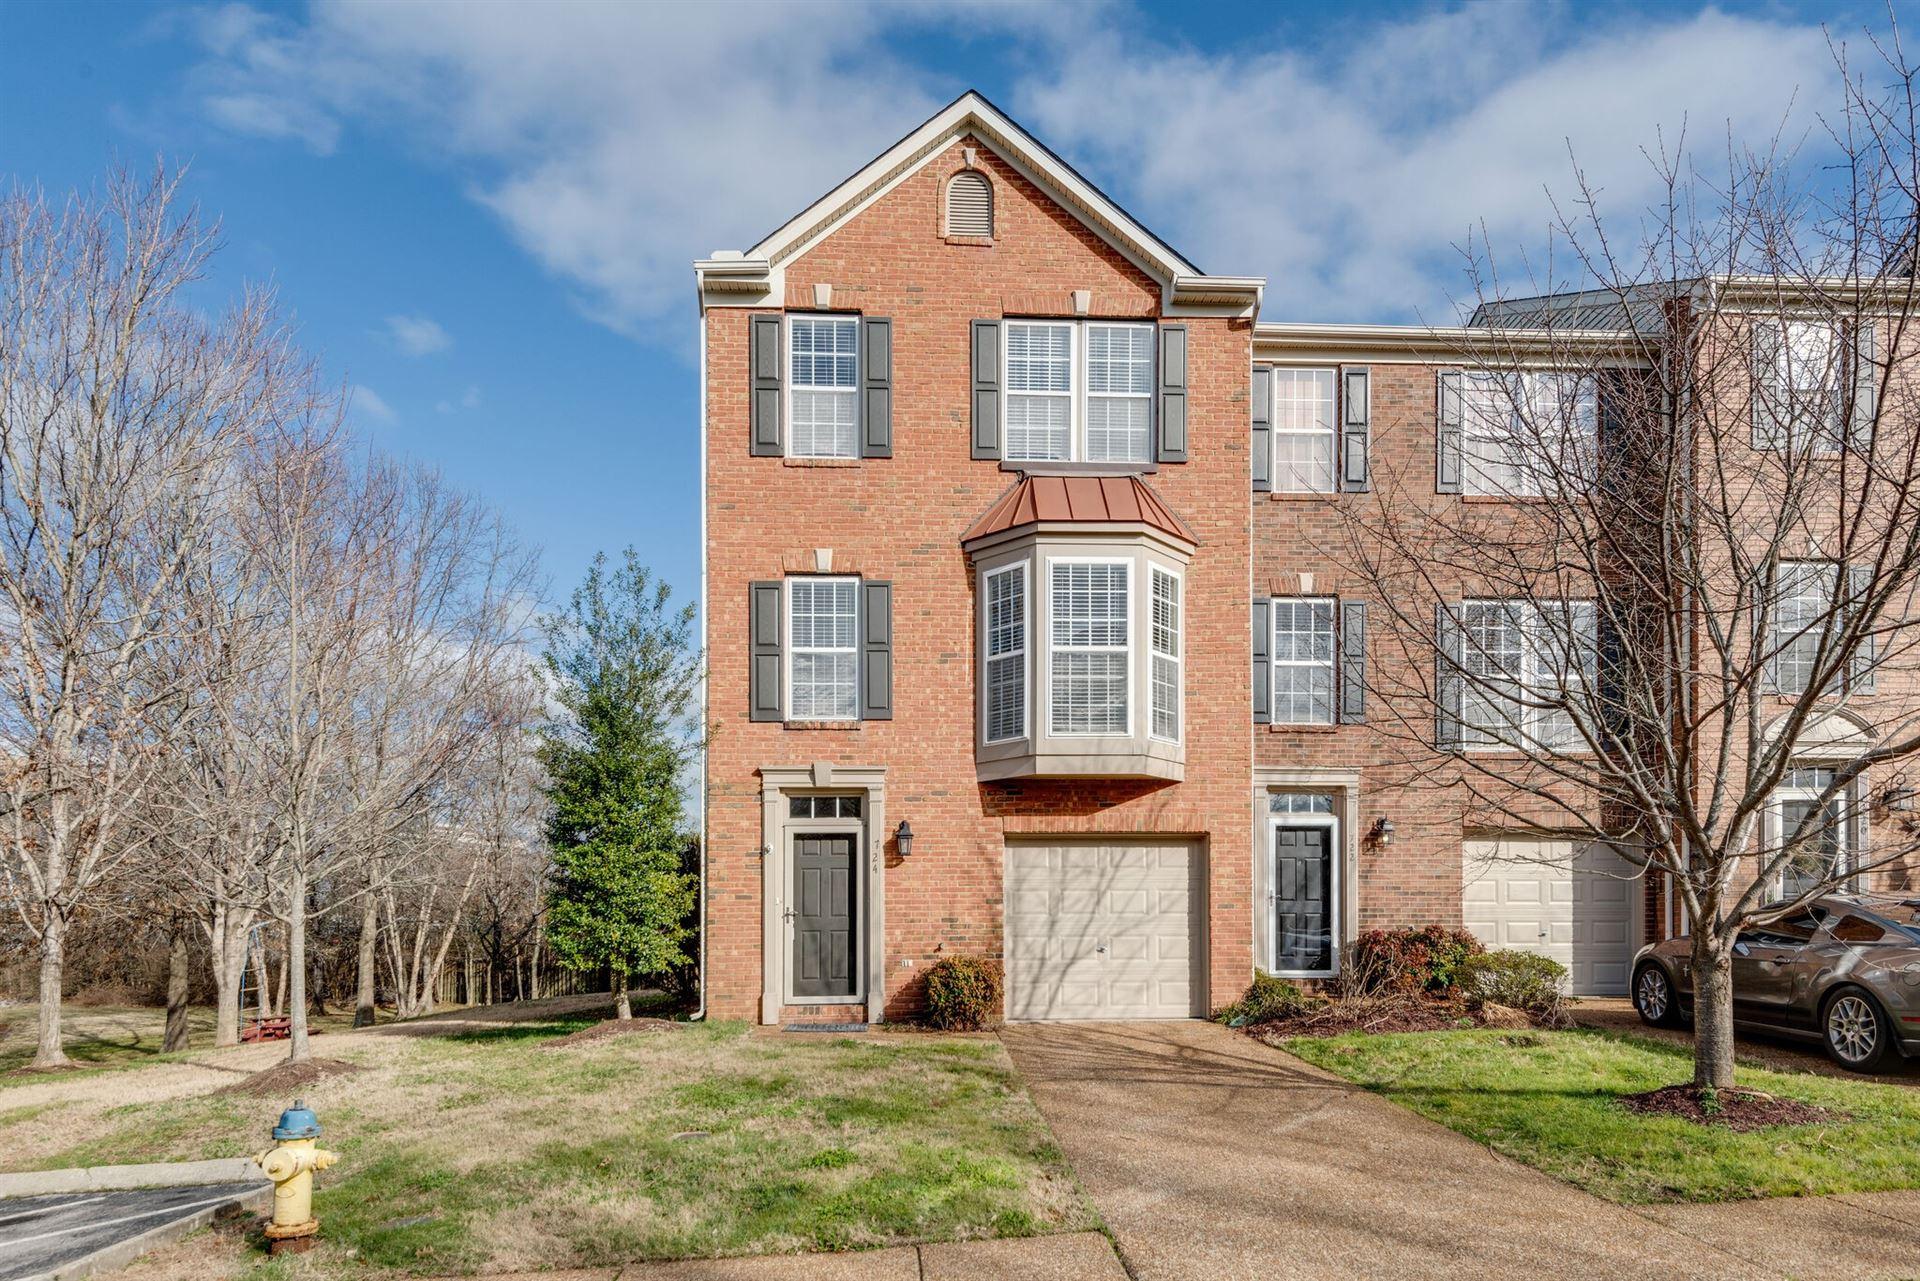 724 Huffine Manor Cir, Franklin, TN 37067 - MLS#: 2217519